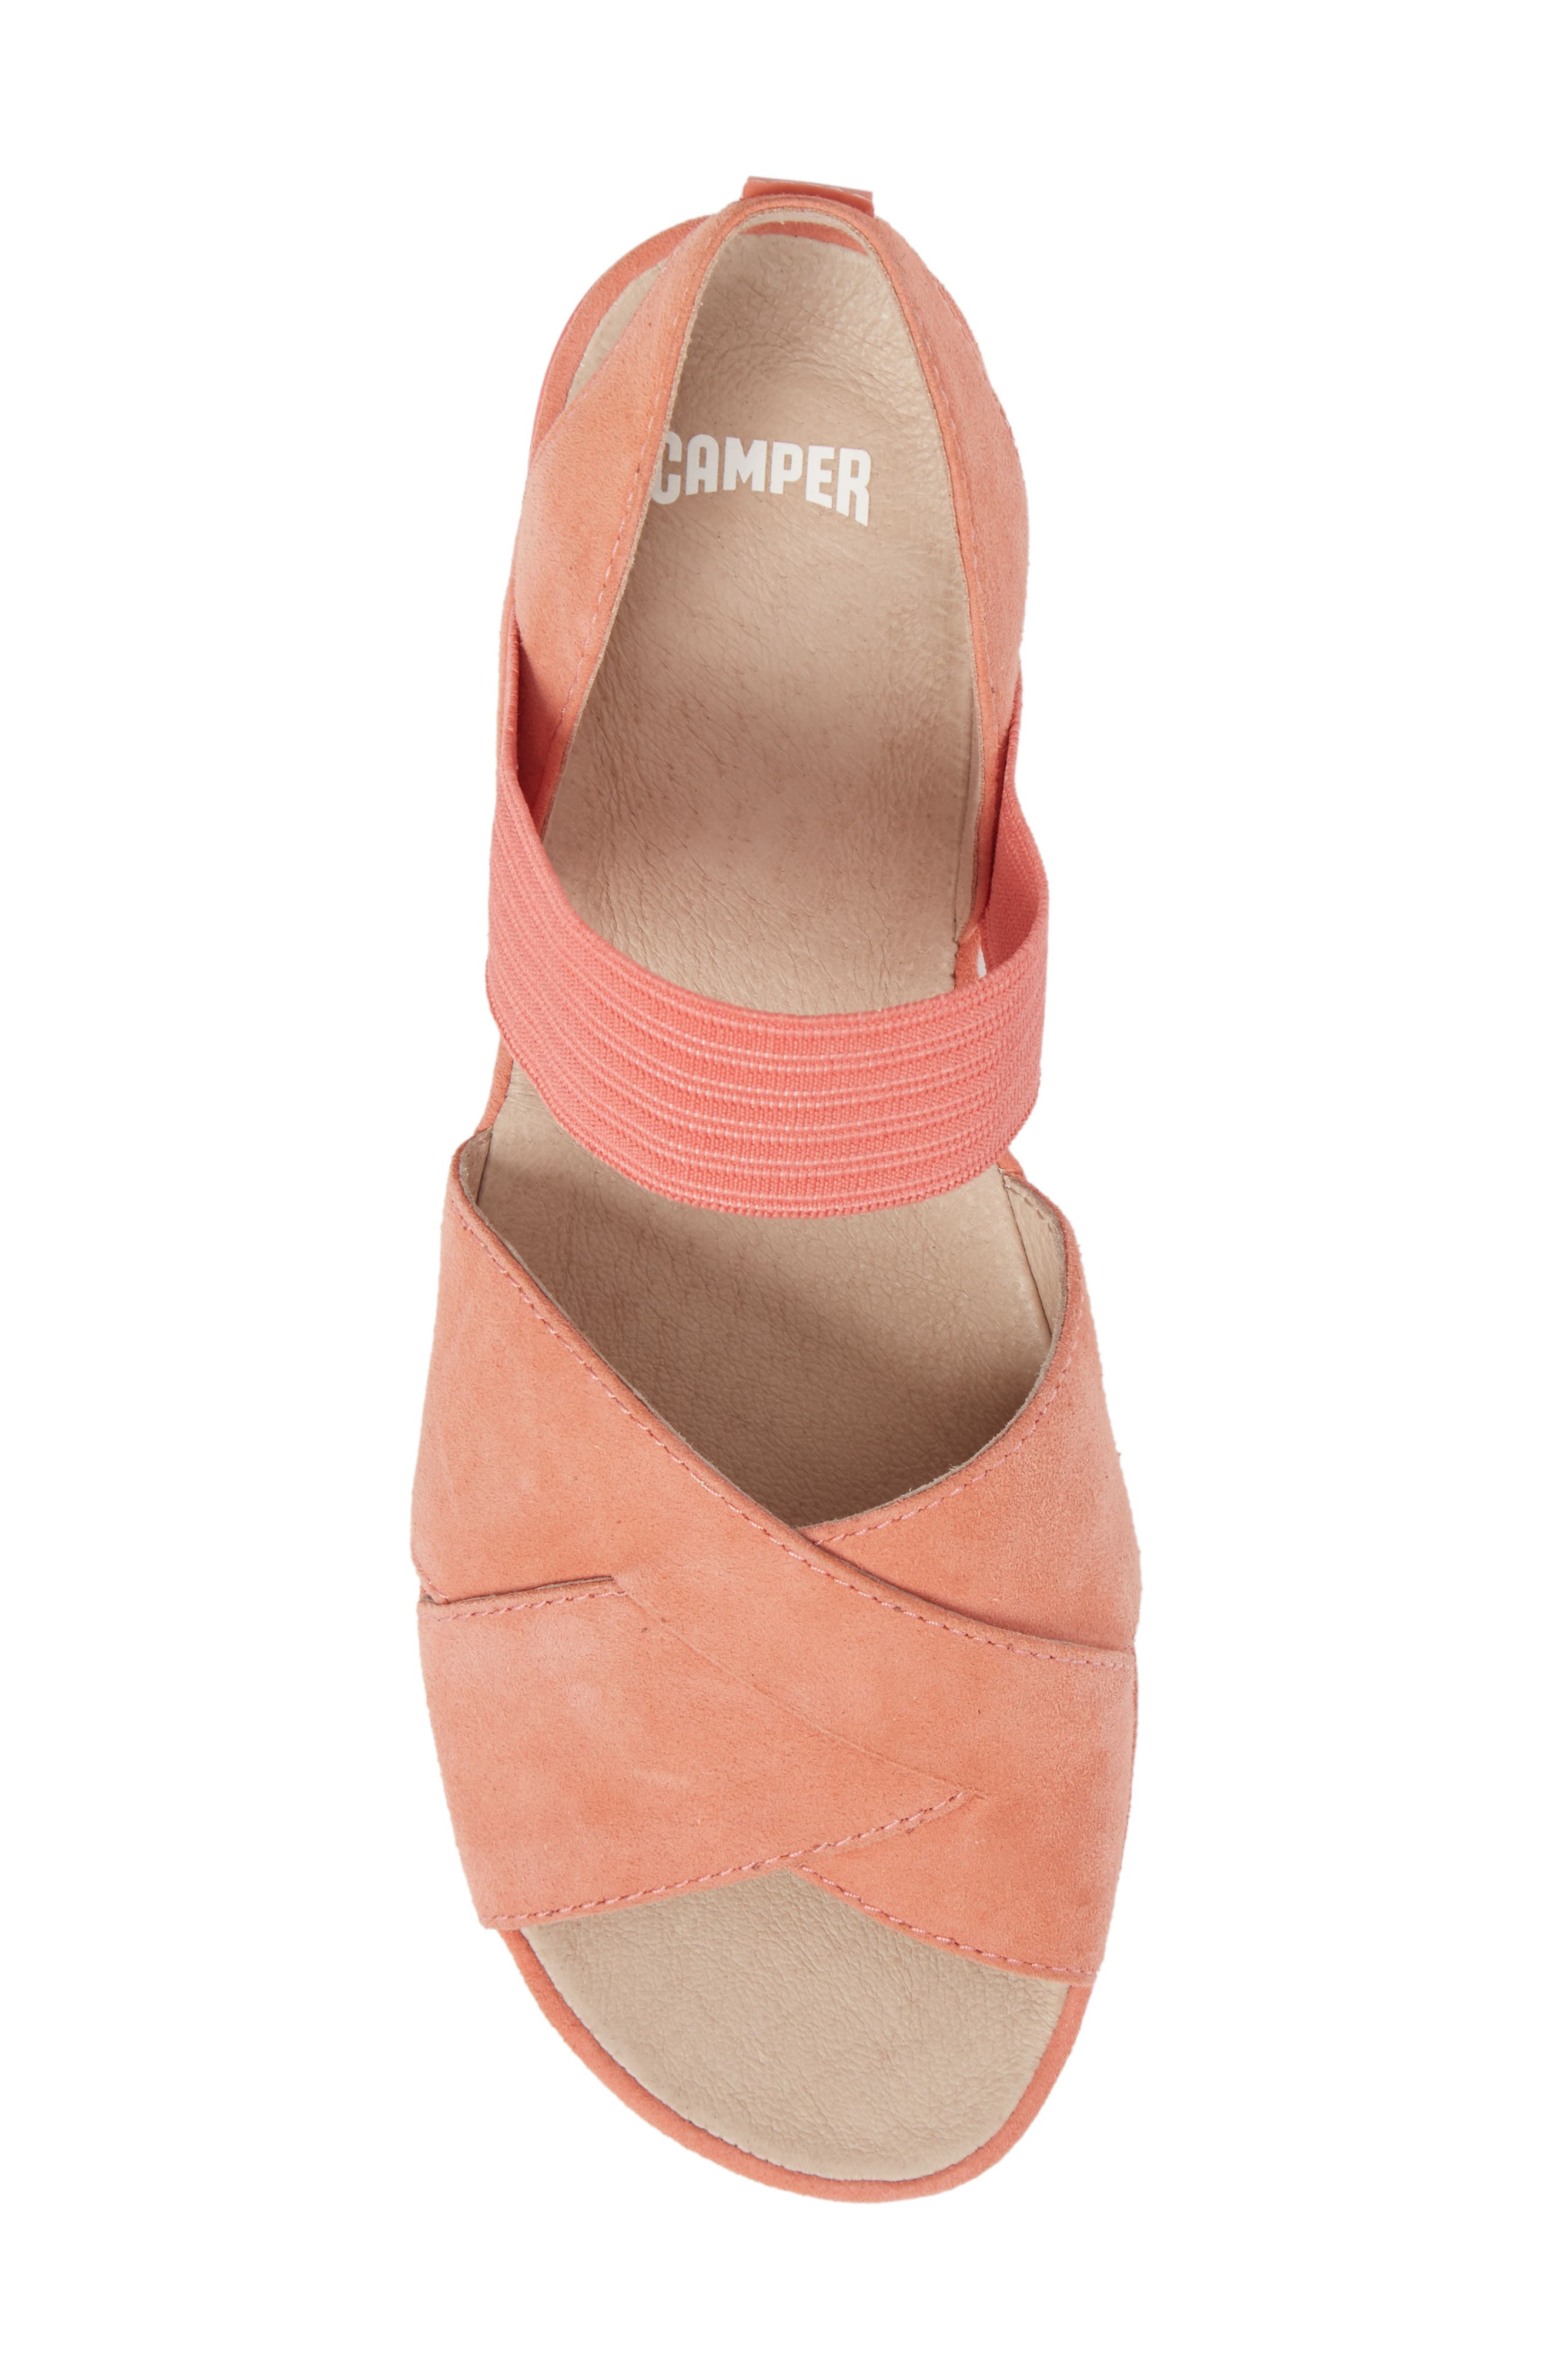 Right Nina Flat Cross Strap Sandal,                             Alternate thumbnail 5, color,                             Medium Pink Leather